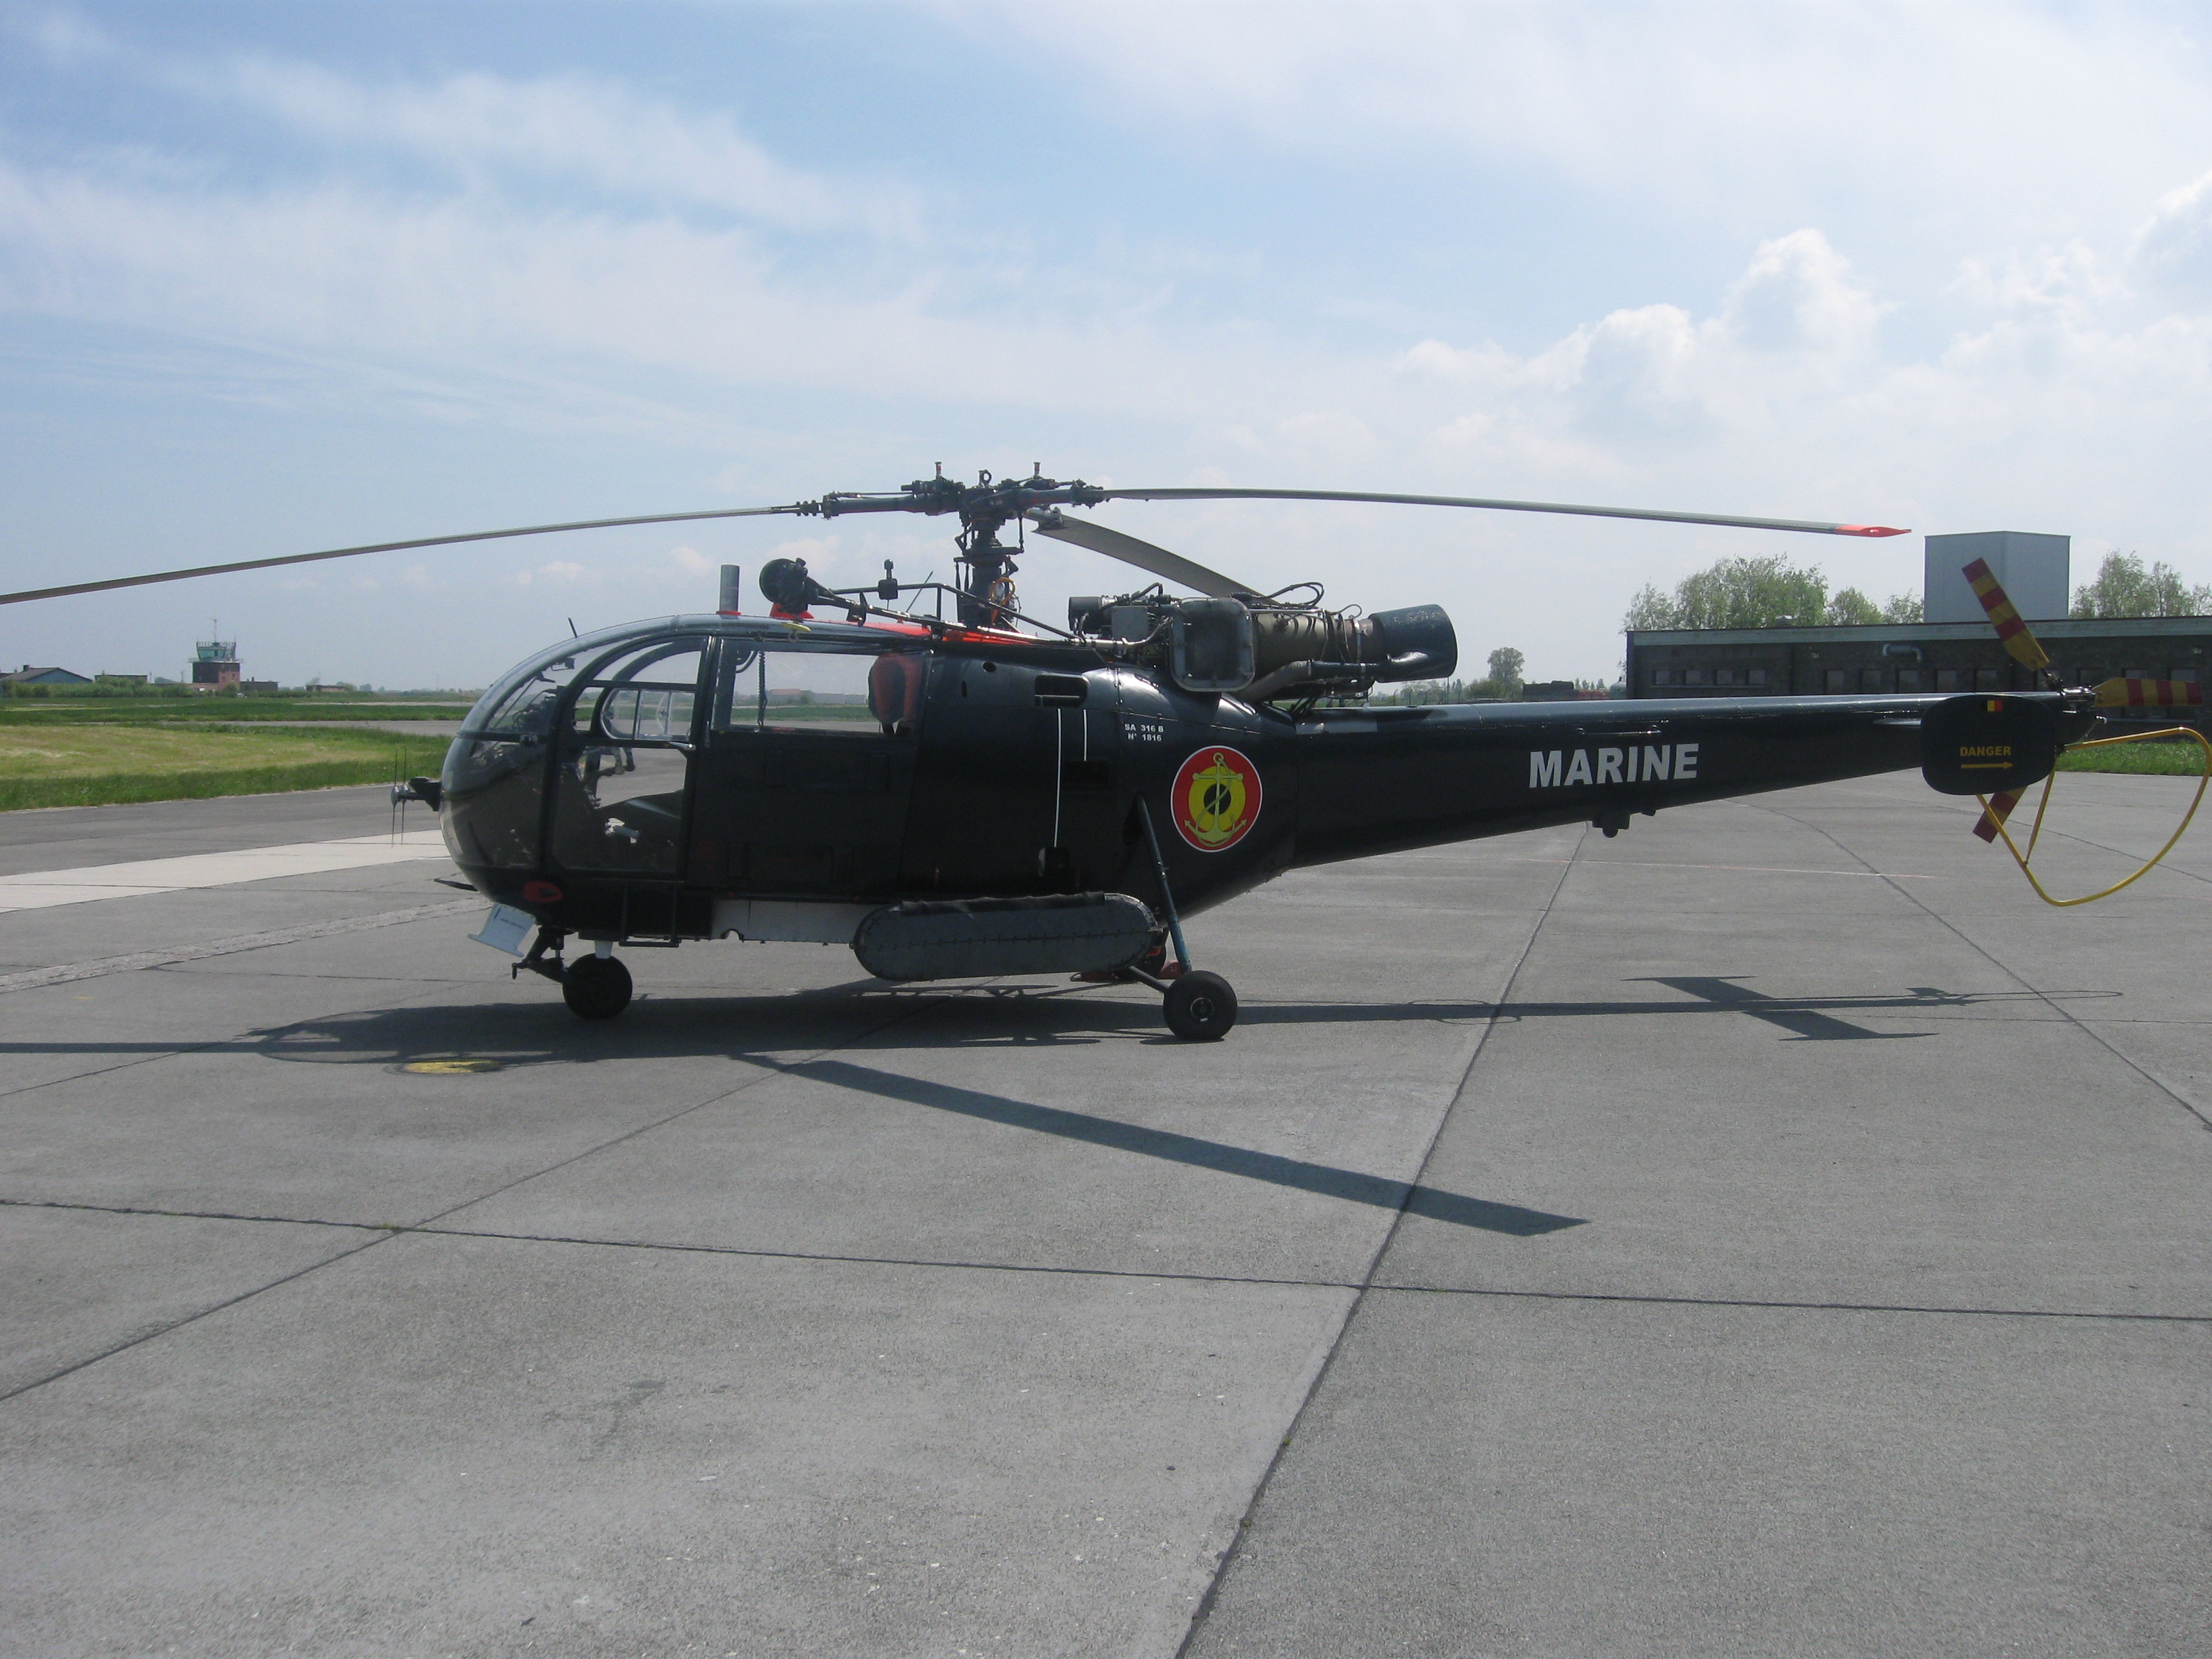 Helico's : divers, photos, infos 1005180811591050246058947